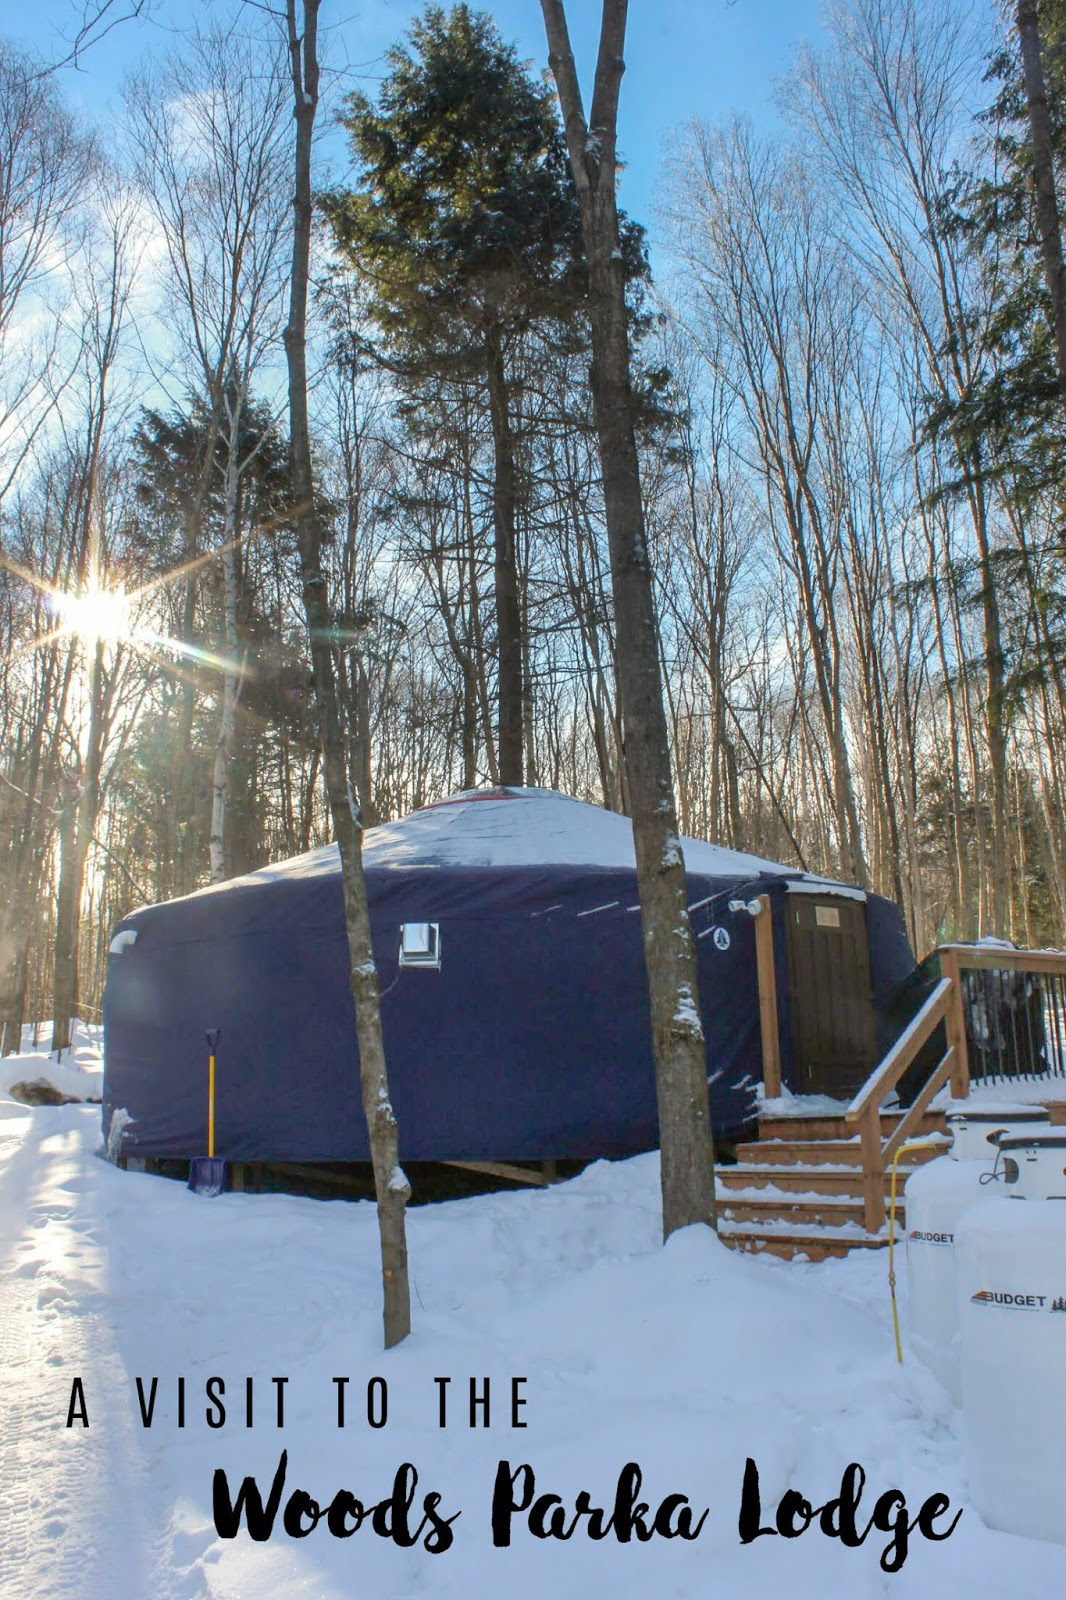 Woods Parka Lodge in Haliburton, Ontario